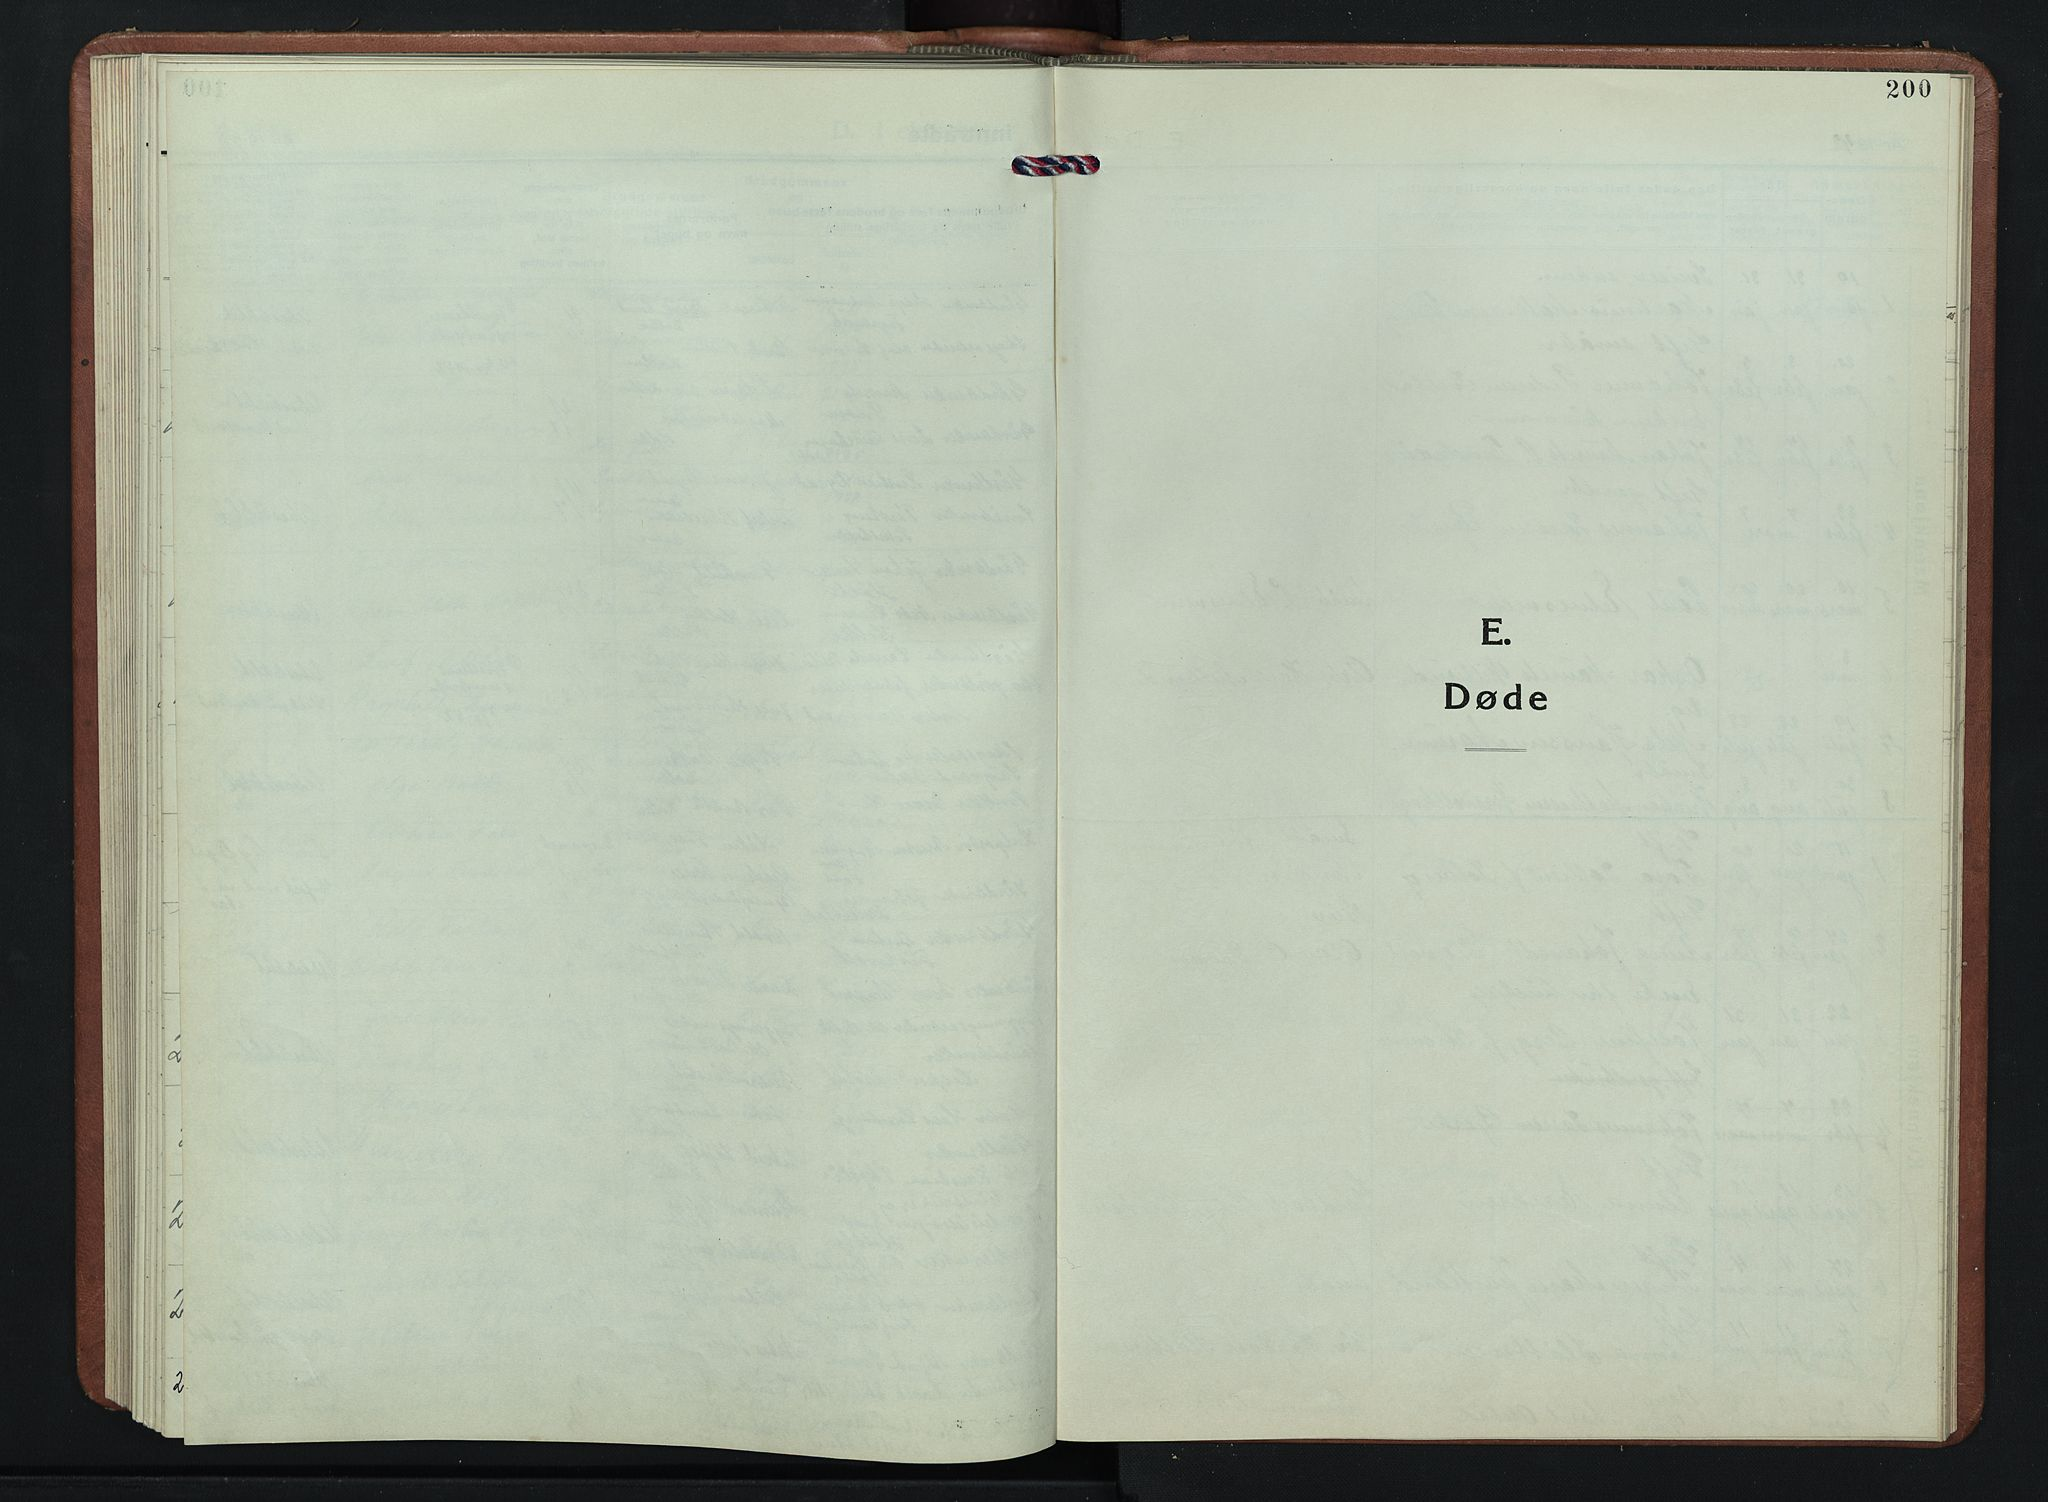 SAH, Kolbu prestekontor, Klokkerbok nr. 4, 1942-1953, s. 200